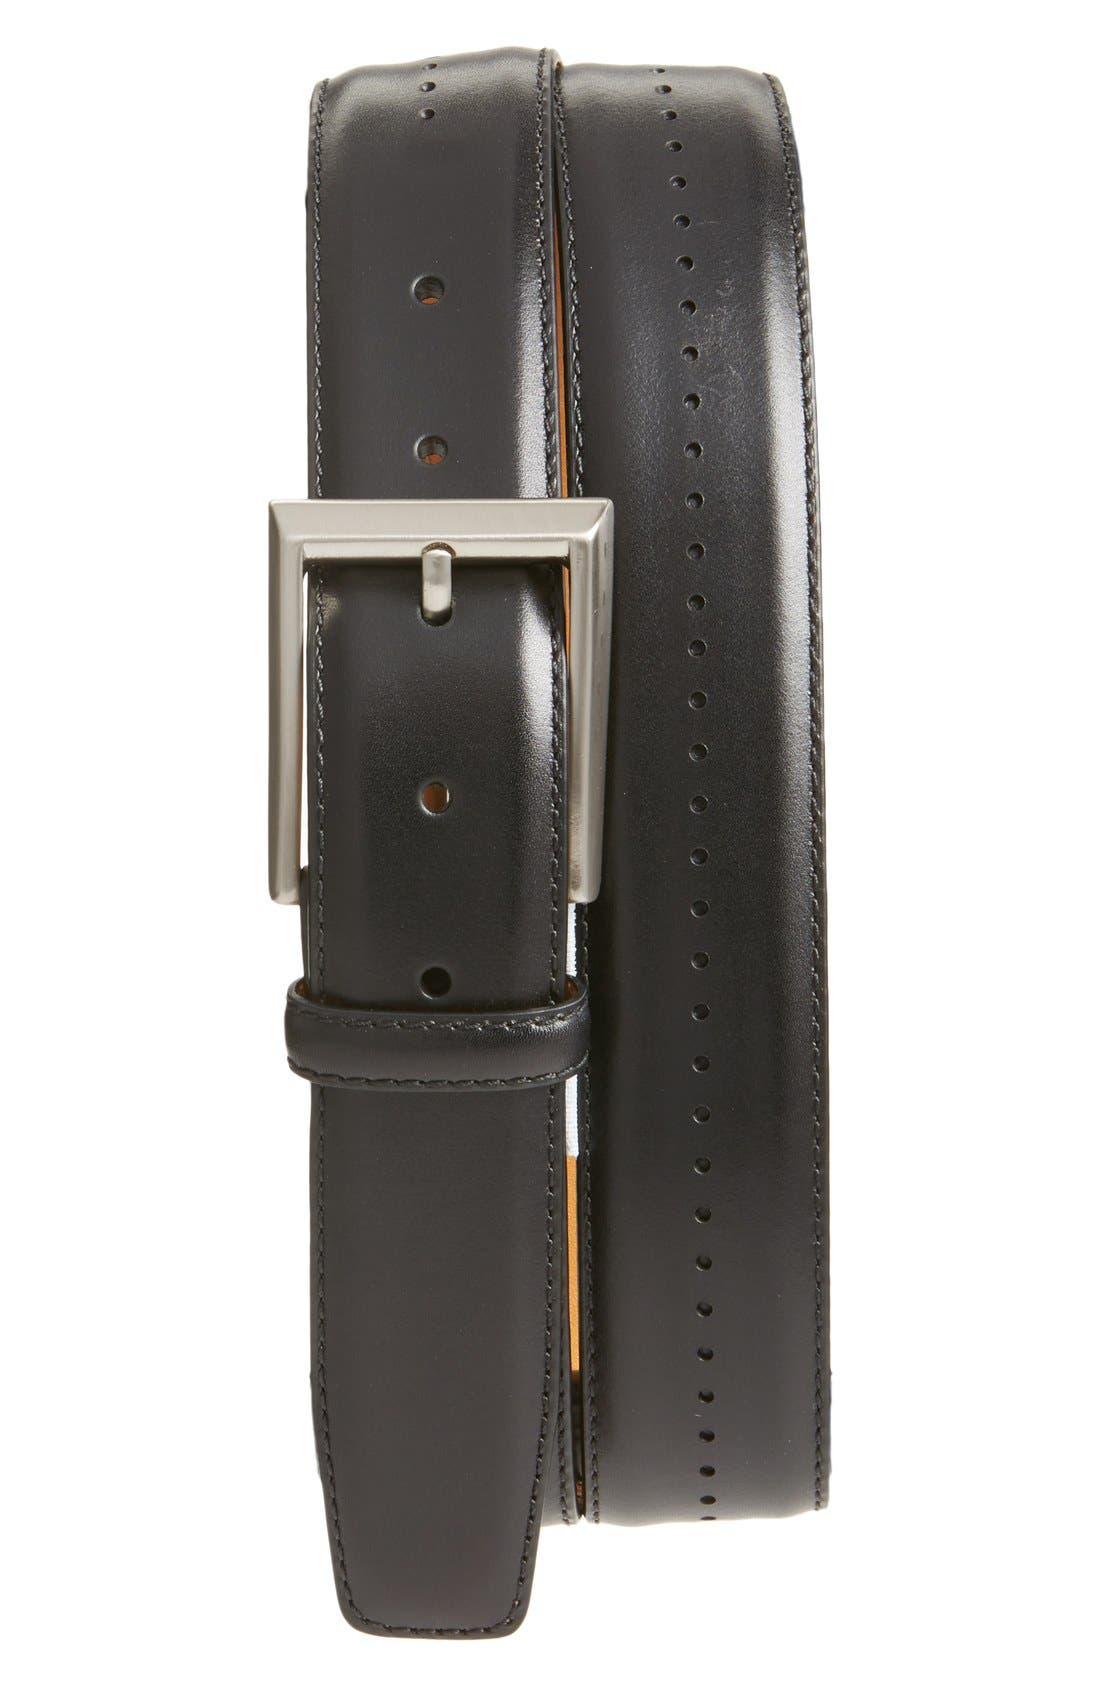 Alternate Image 1 Selected - Magnanni 'Catalux' Leather Belt